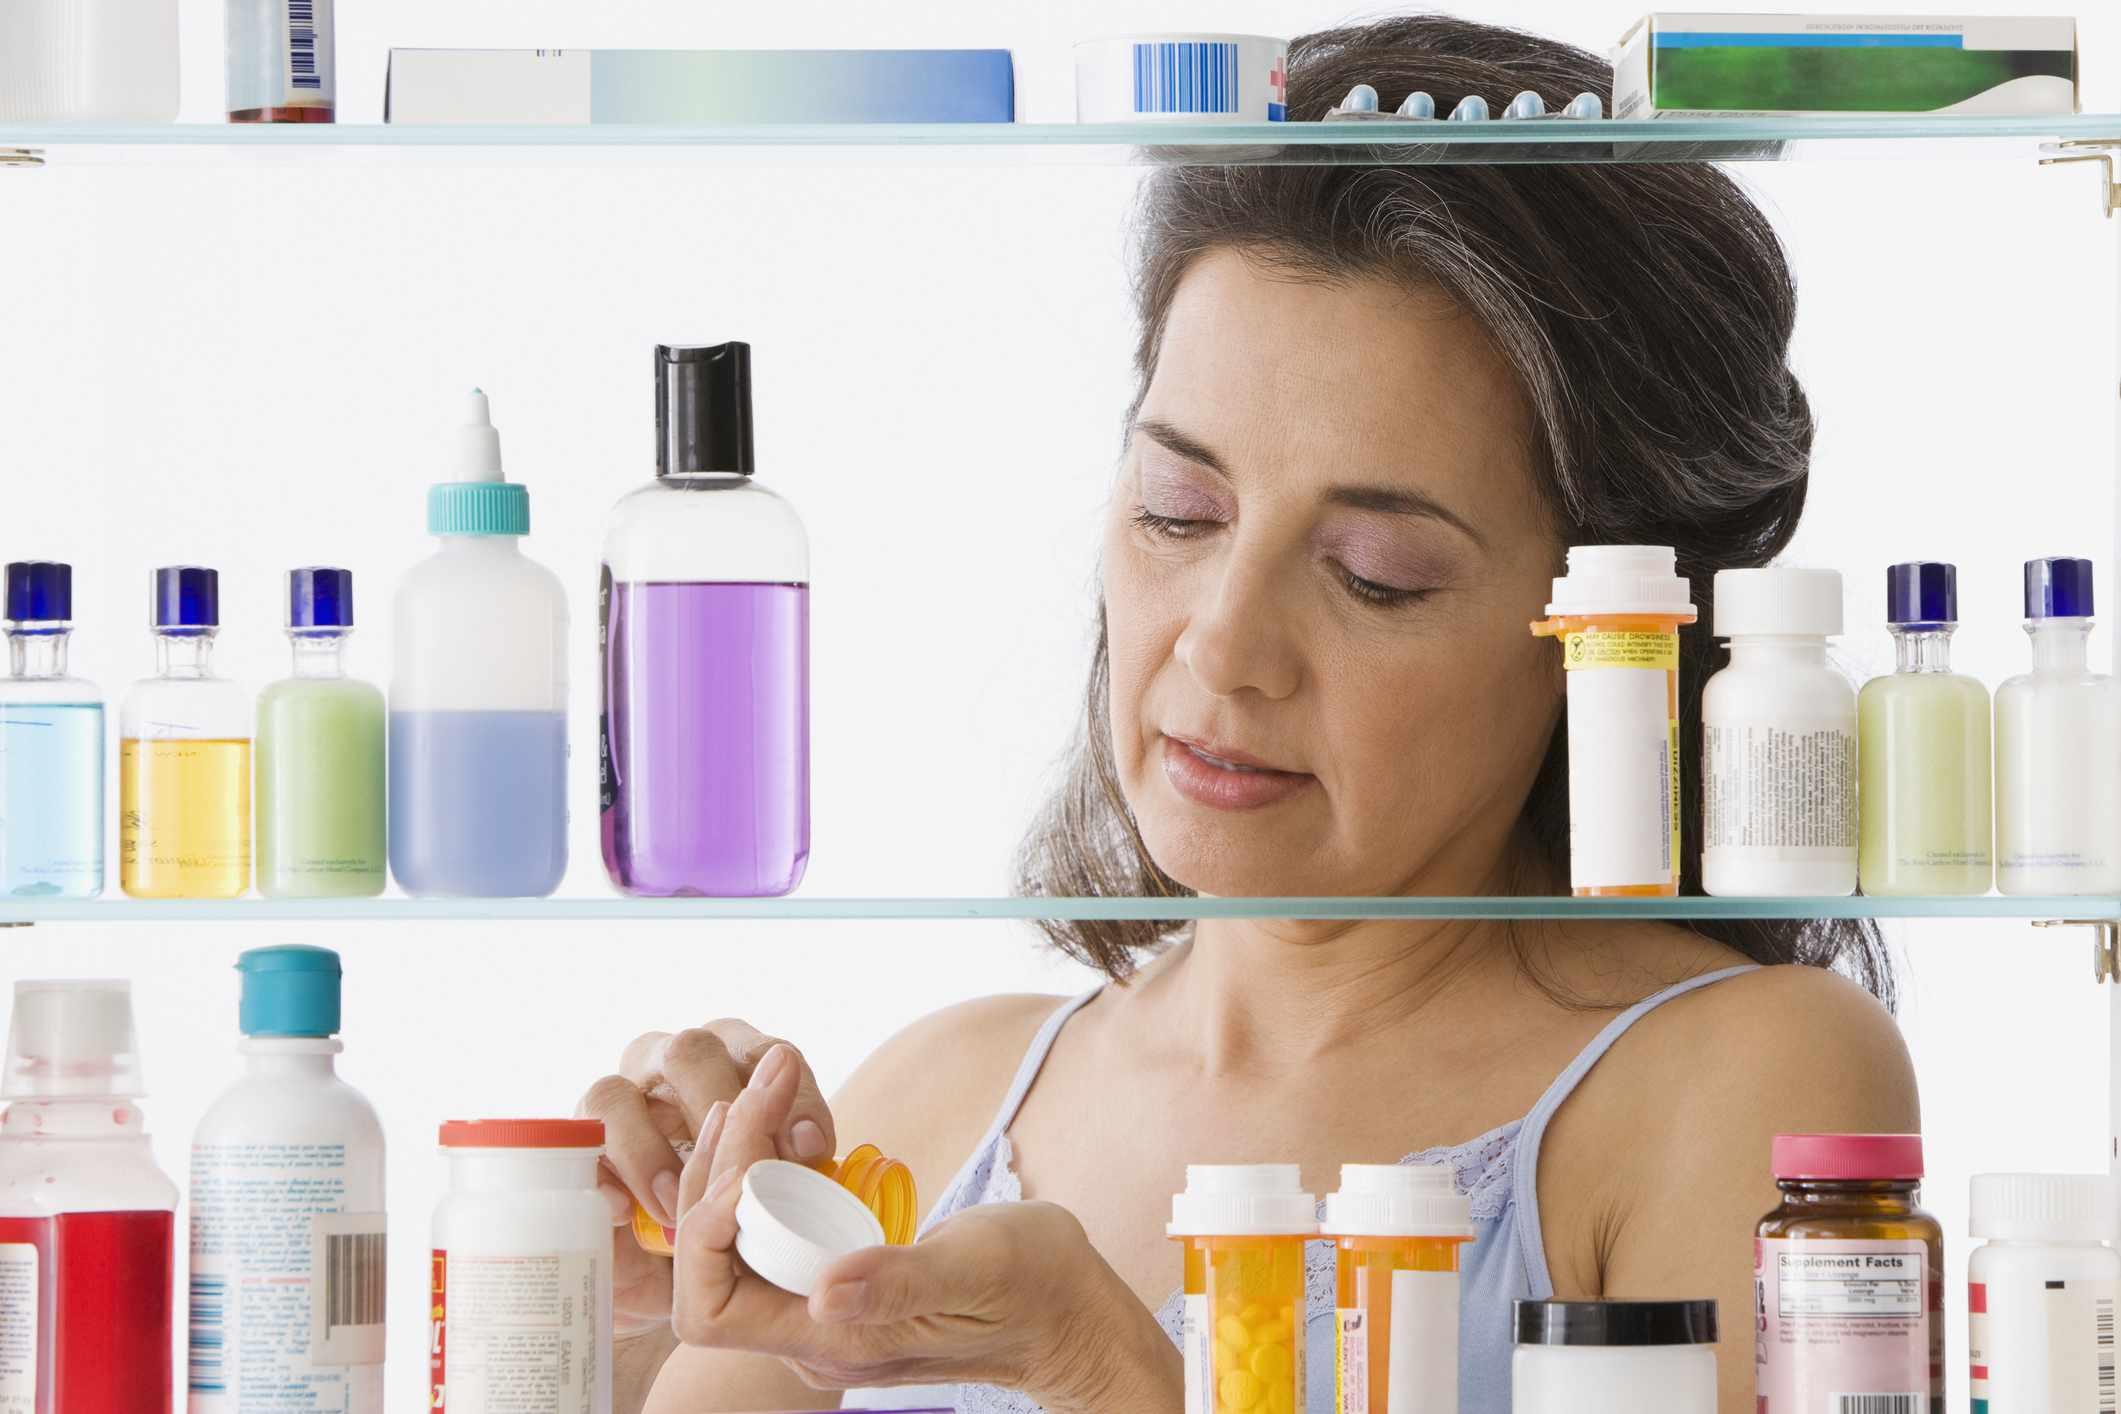 woman taking medication in bathroom